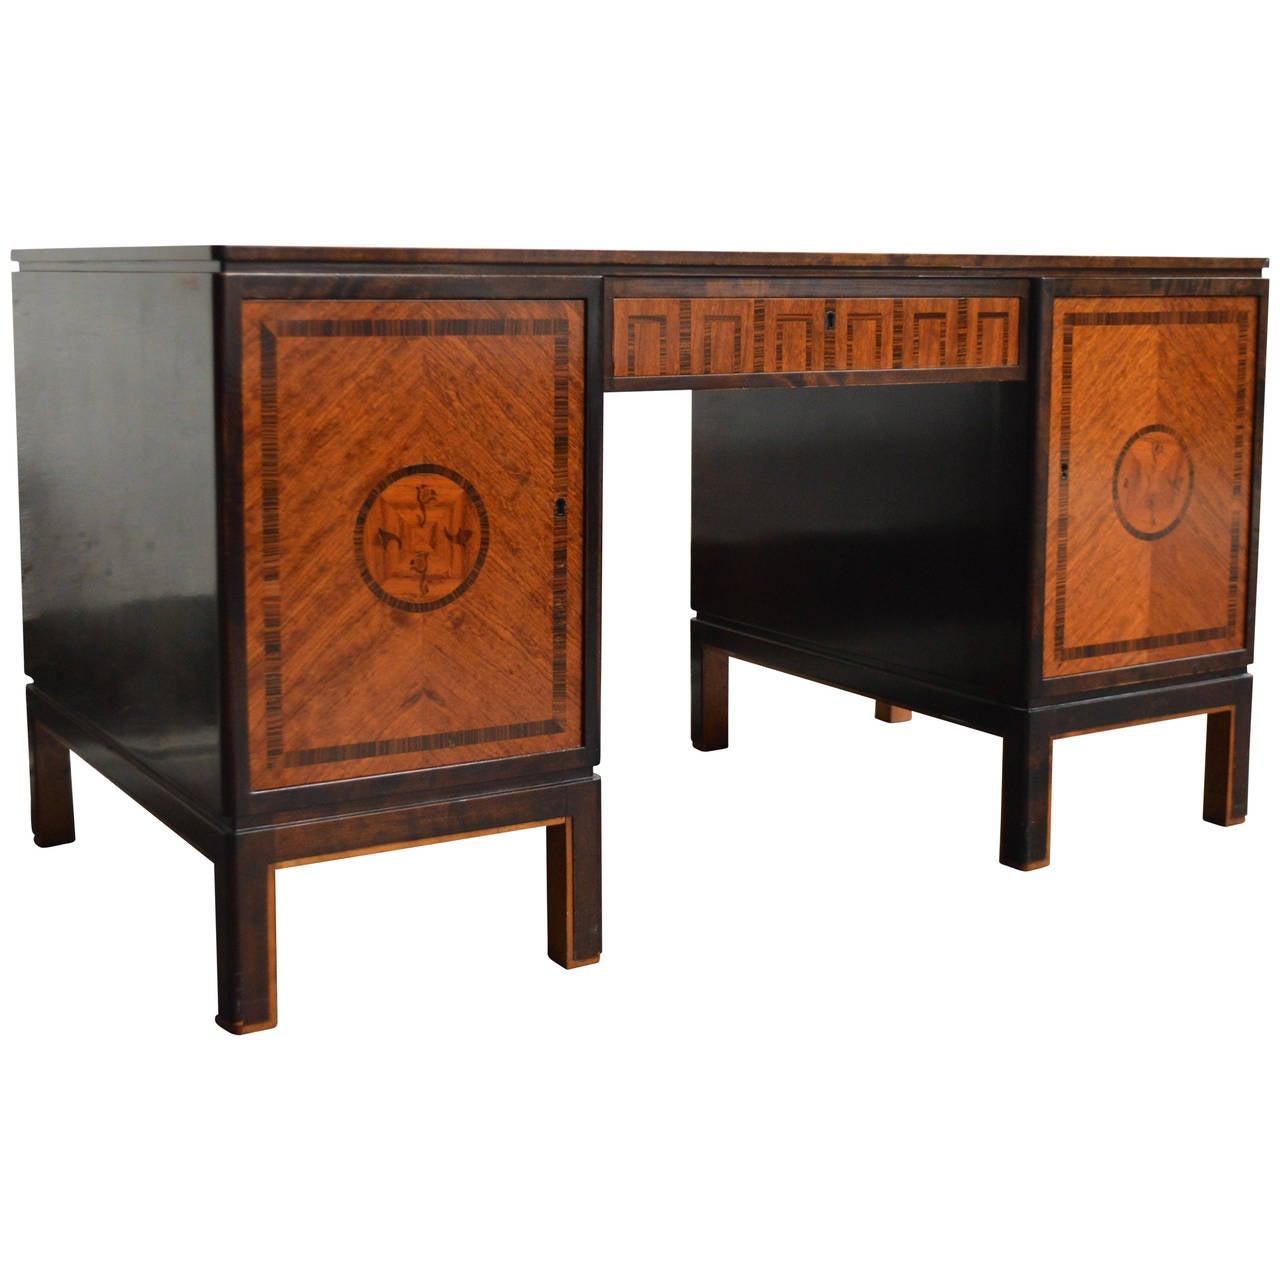 Carl Malmsten Swedish Grace Executive Desk For Sale at 1stdibs